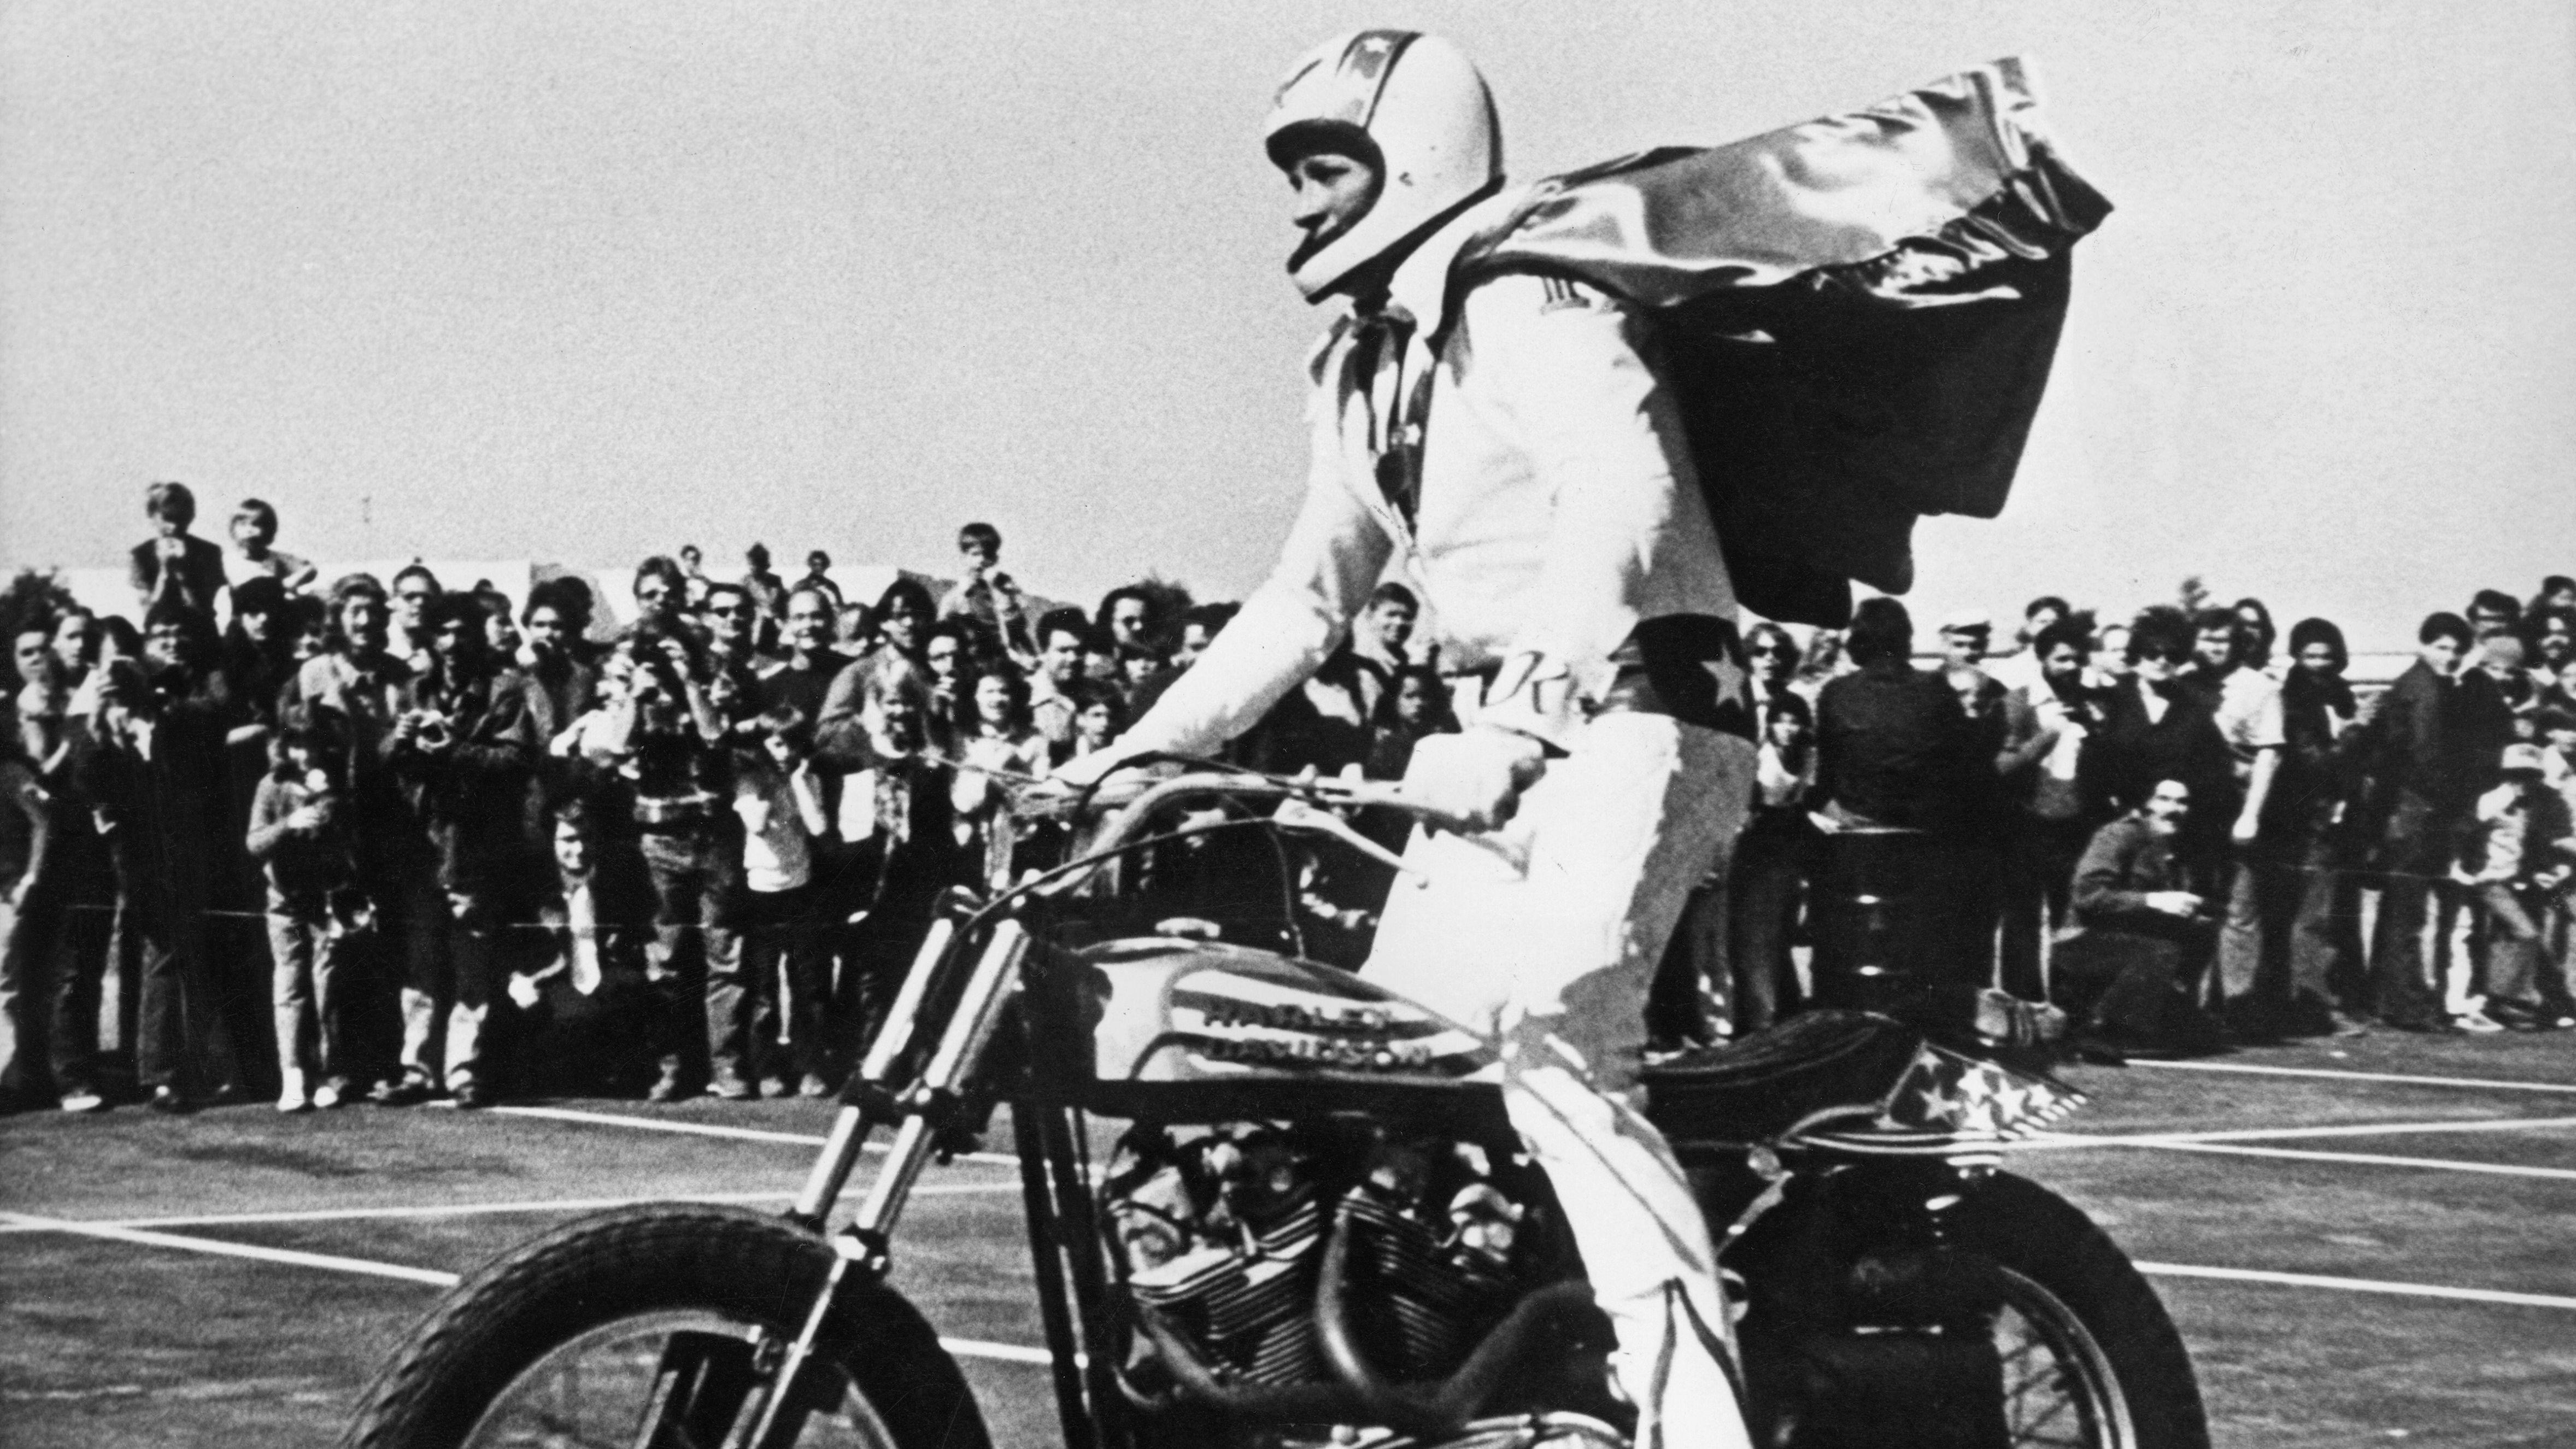 Evel Knievel Harley Auction: Evel Knievel, Insurance Salesman